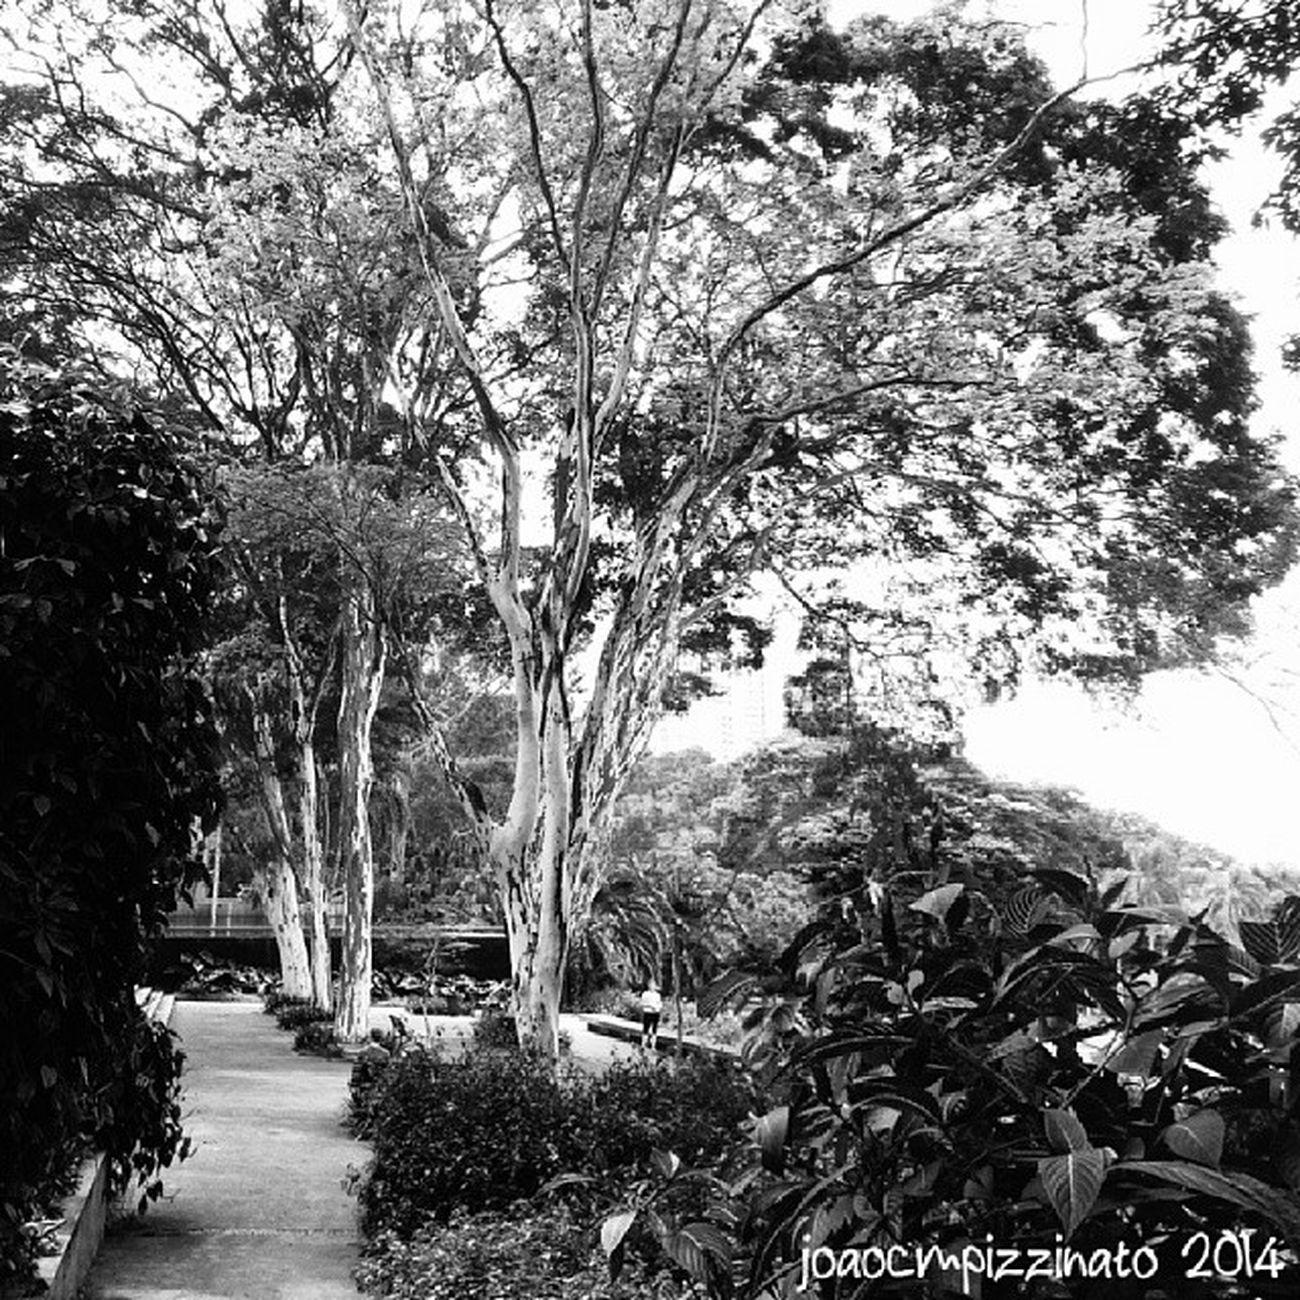 Nature in black and white. Tree Plants Nature Blackandwhite city zonasul saopaulo brasil photography burlemarx amorpaulistanobw